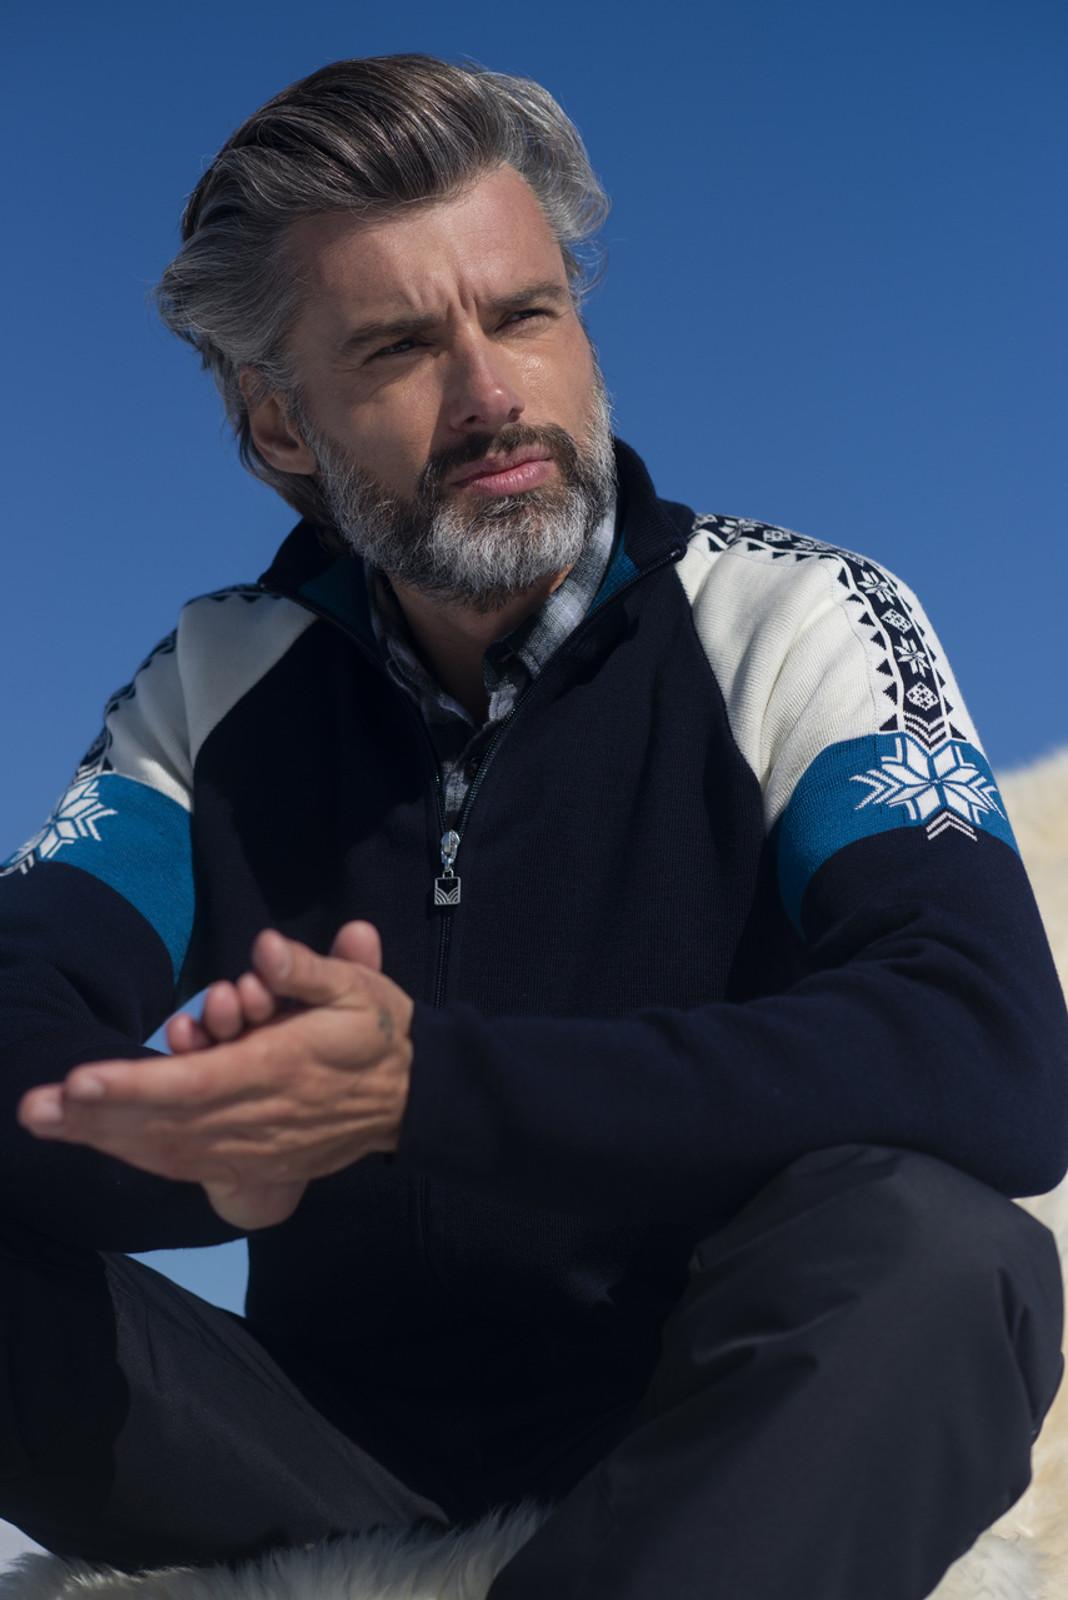 Man wearing Dale of Norway Men's Geilo Cardigan in Navy/Off White/Arctic Blue, 83531-C